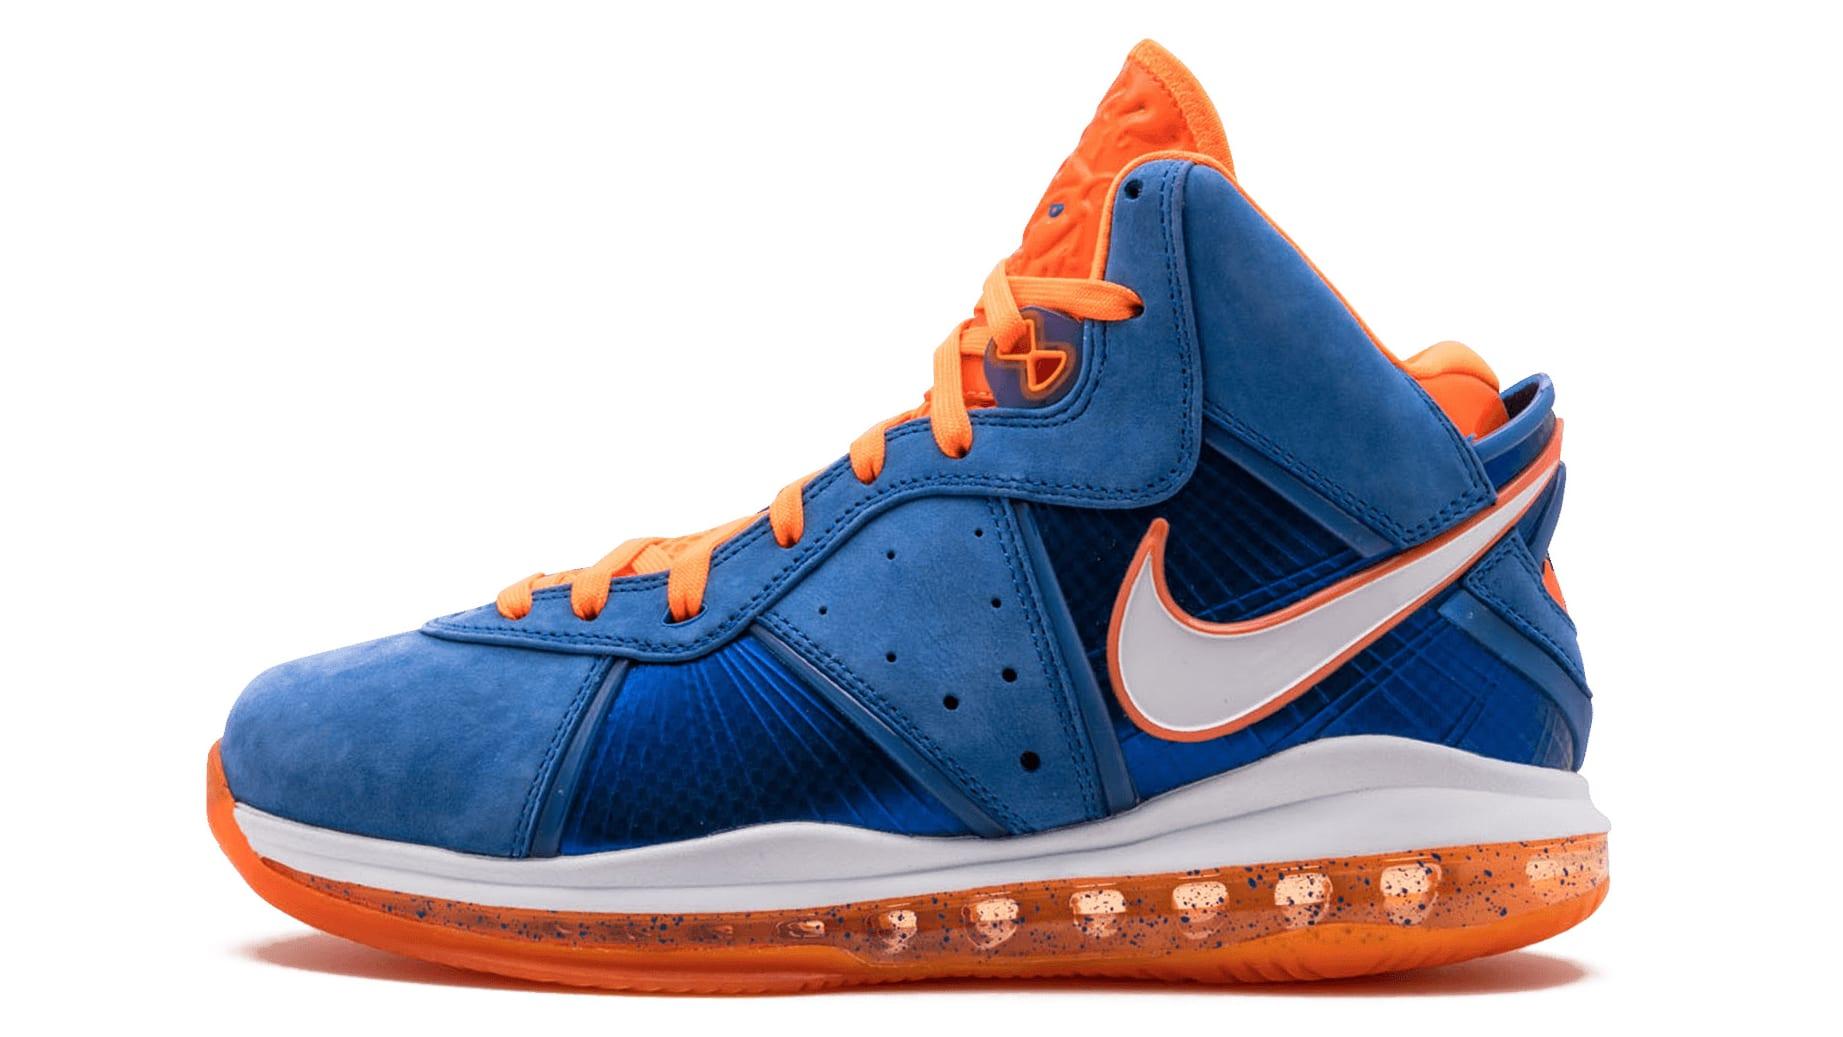 Nike LeBron 8 HWC Release Date CV1750-400 Profile